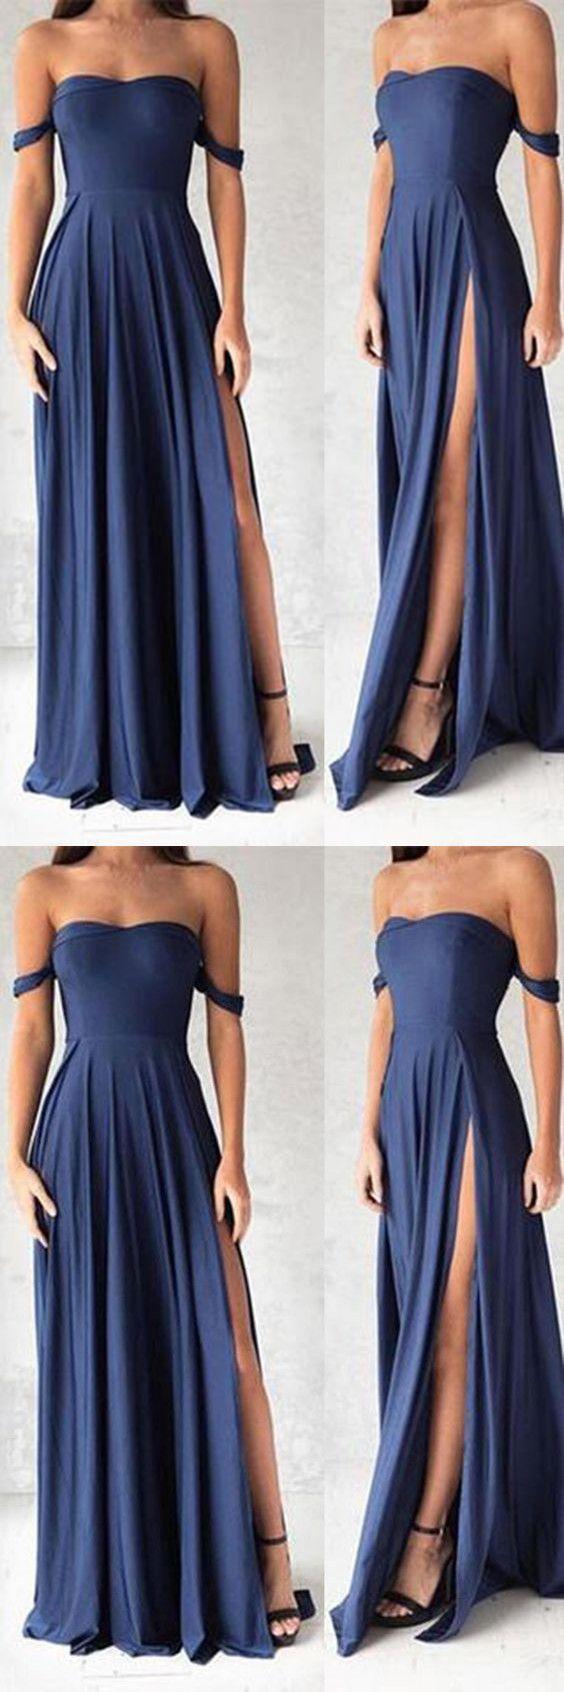 Navy Blue Prom Dresses,Elegant Evening Dresses,Long Formal Gowns,Slit Party Dresses,Chiffon Pageant Formal Dress